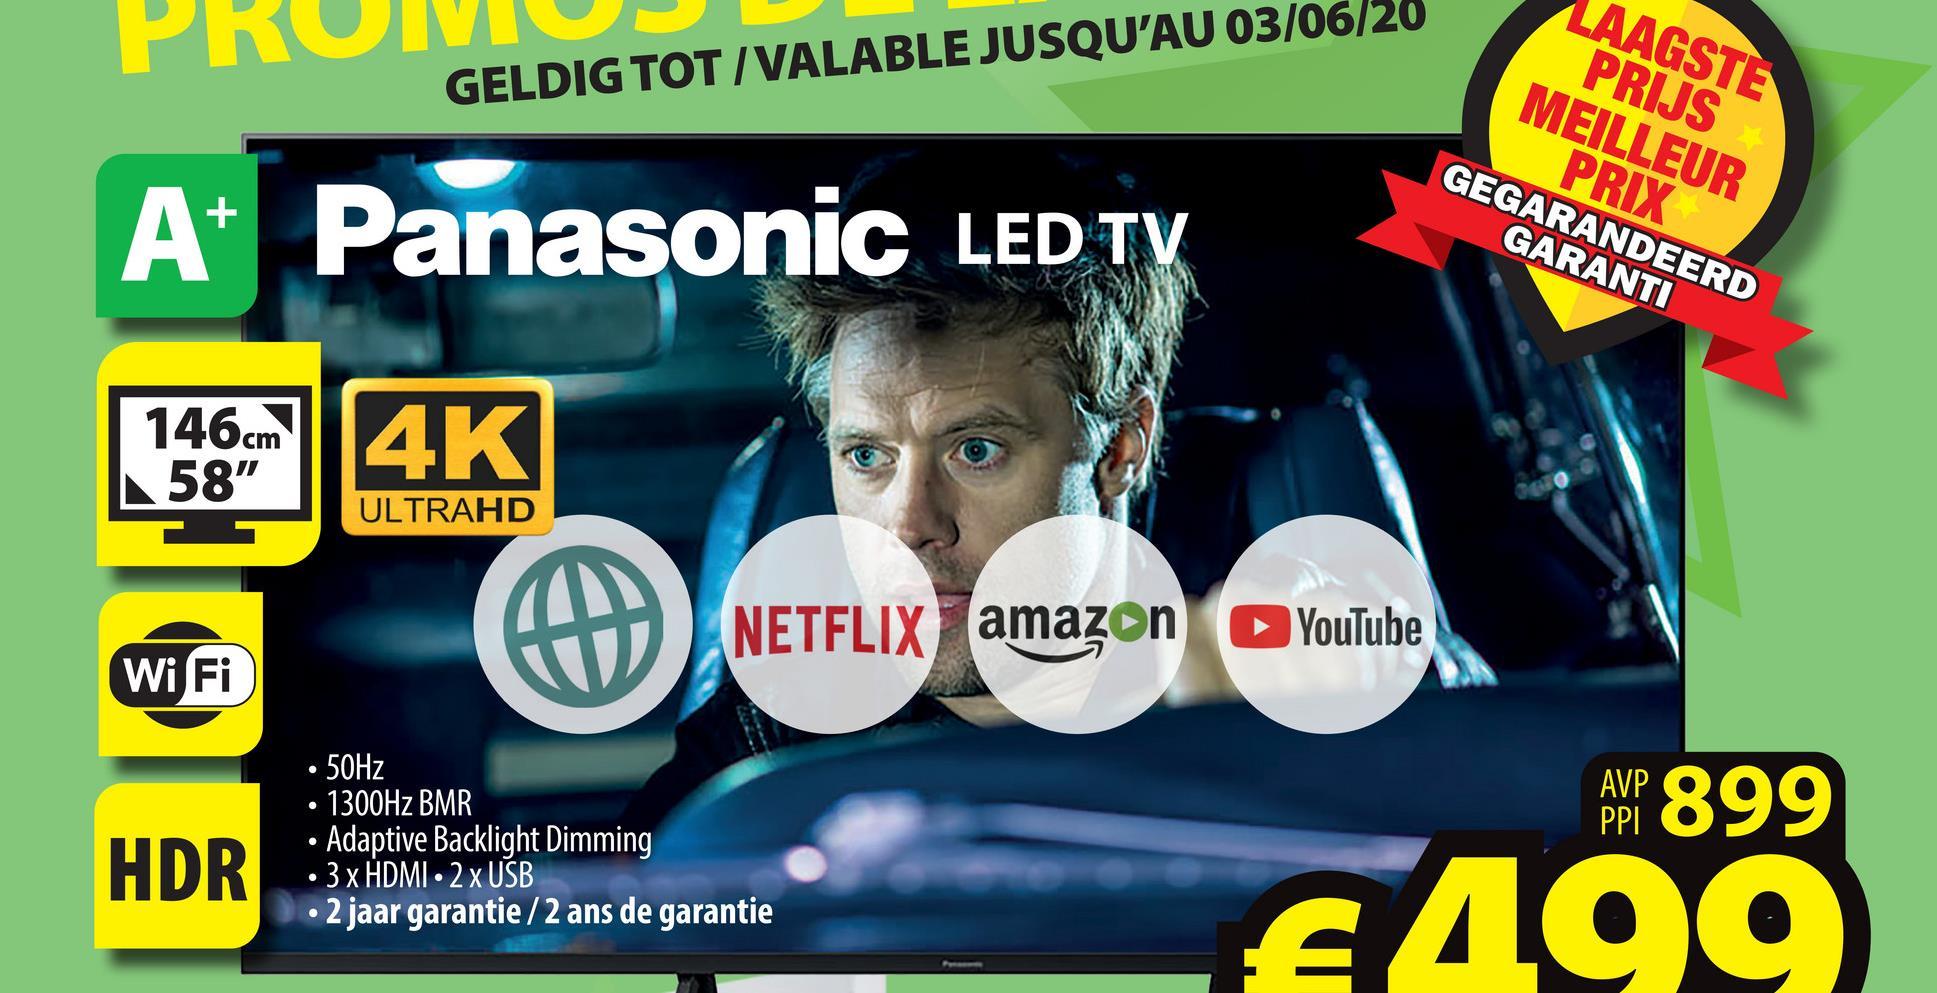 "GELDIG TOT/VALABLE JUSQU'AU 03/06/20 AAGSTE PRIJS MEILLEUR PRIX GEGARANDEERD GARANTI A+ Panasonic LED TV 146cm ||4K 58"" ULTRAHD NETFLIX amazon YouTube Wi Fi AWP 899 HDR • 50Hz · 1300Hz BMR • Adaptive Backlight Dimming 3 x HDMI - 2 x USB 2 jaar garantie / 2 ans de garantie 4499"